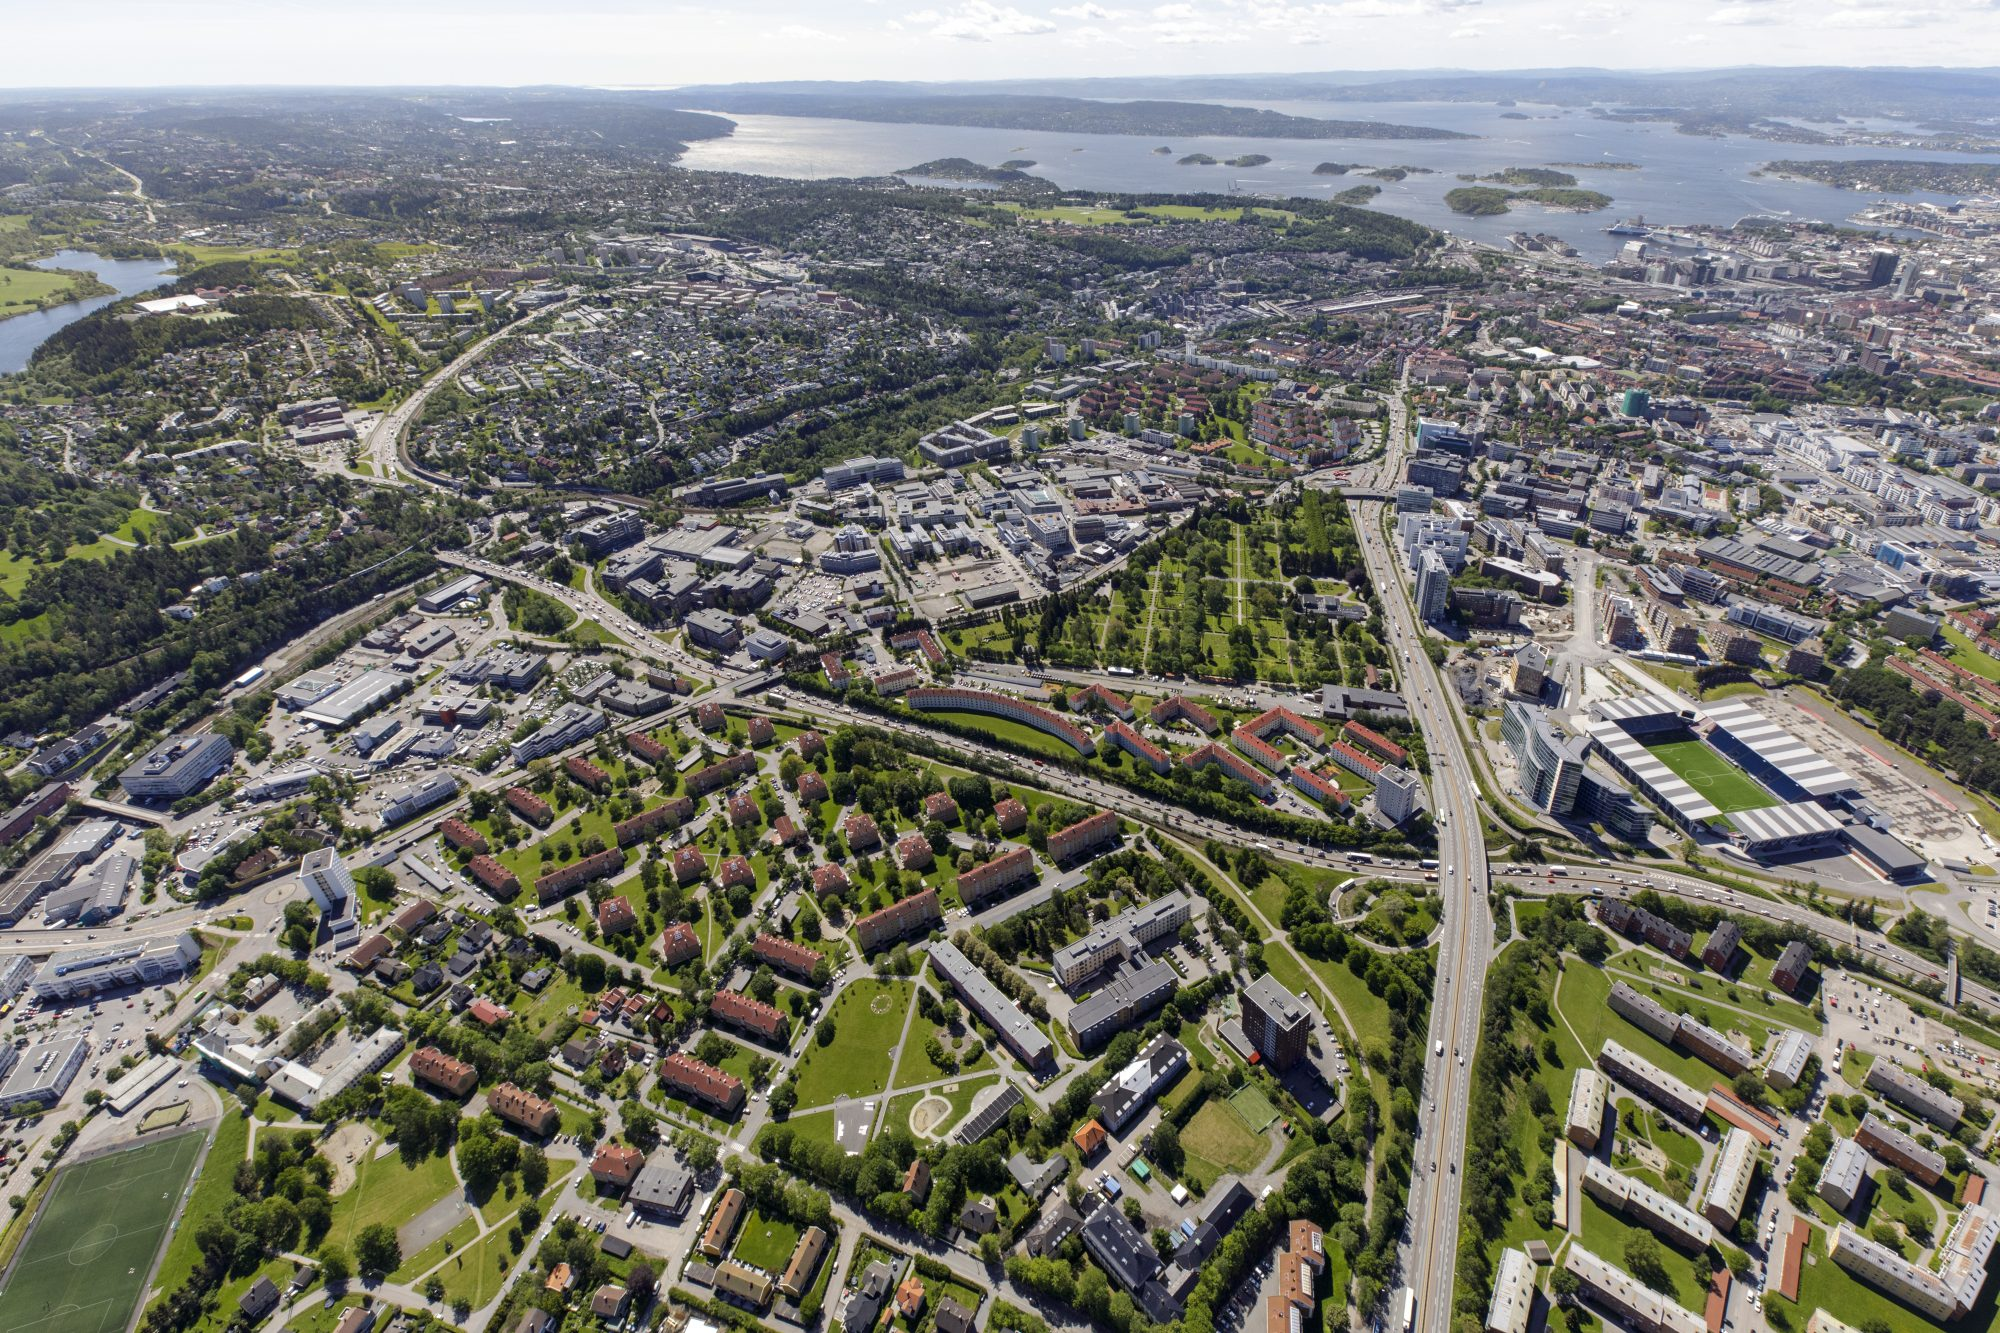 Flyfoto Juni 2019: Bryn-Helsfyr. Foto: nyebilder.no